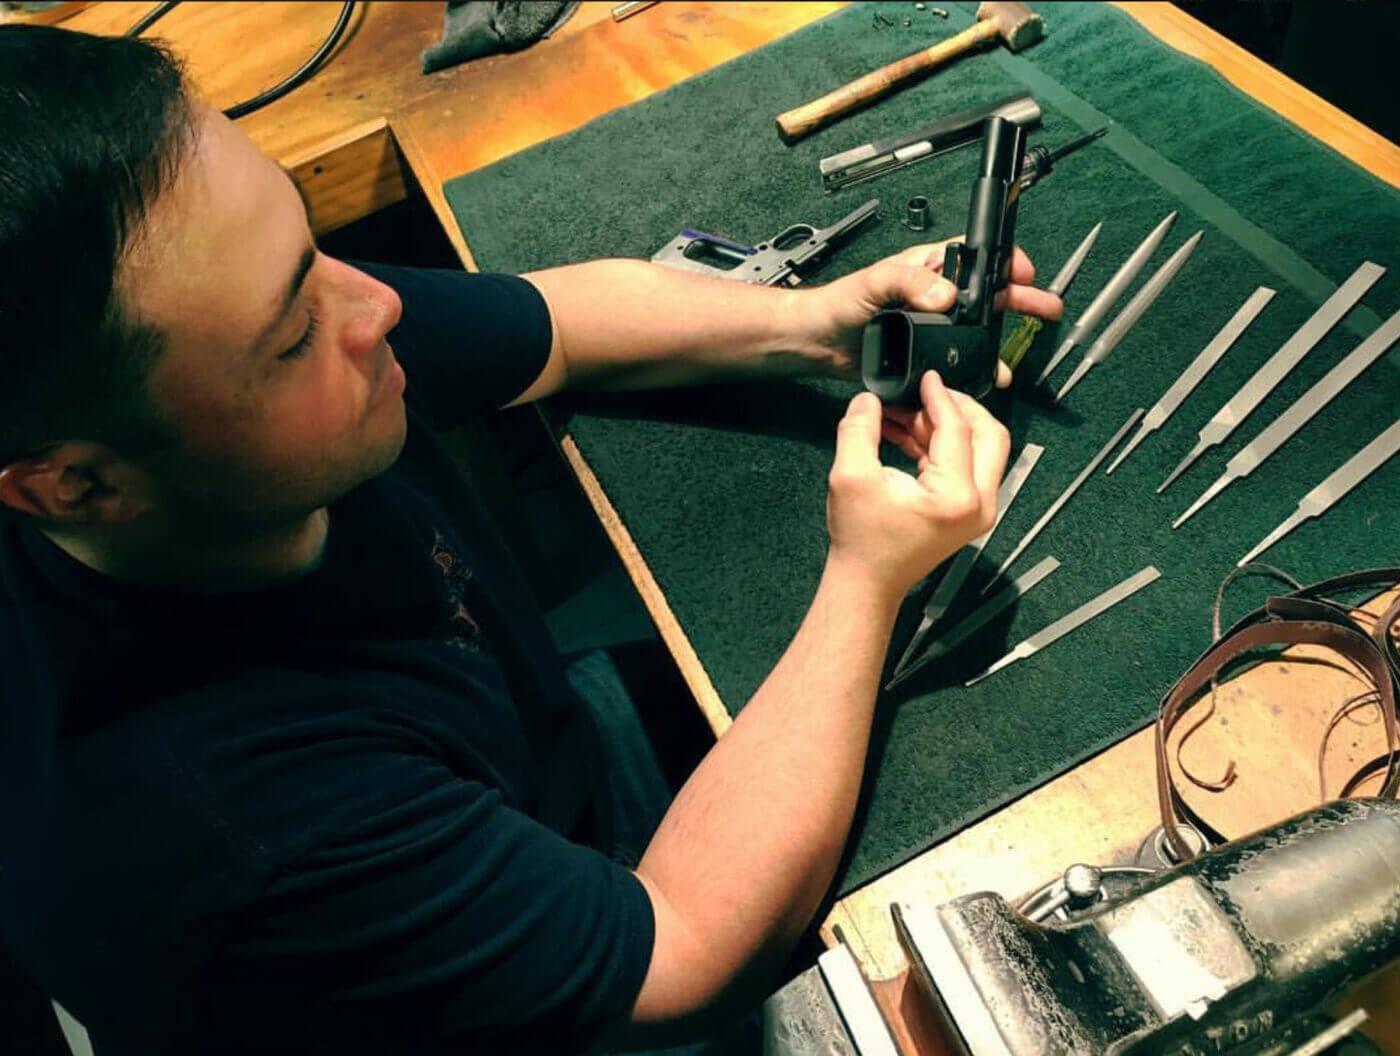 Jason Burton inspecting a custom pistol